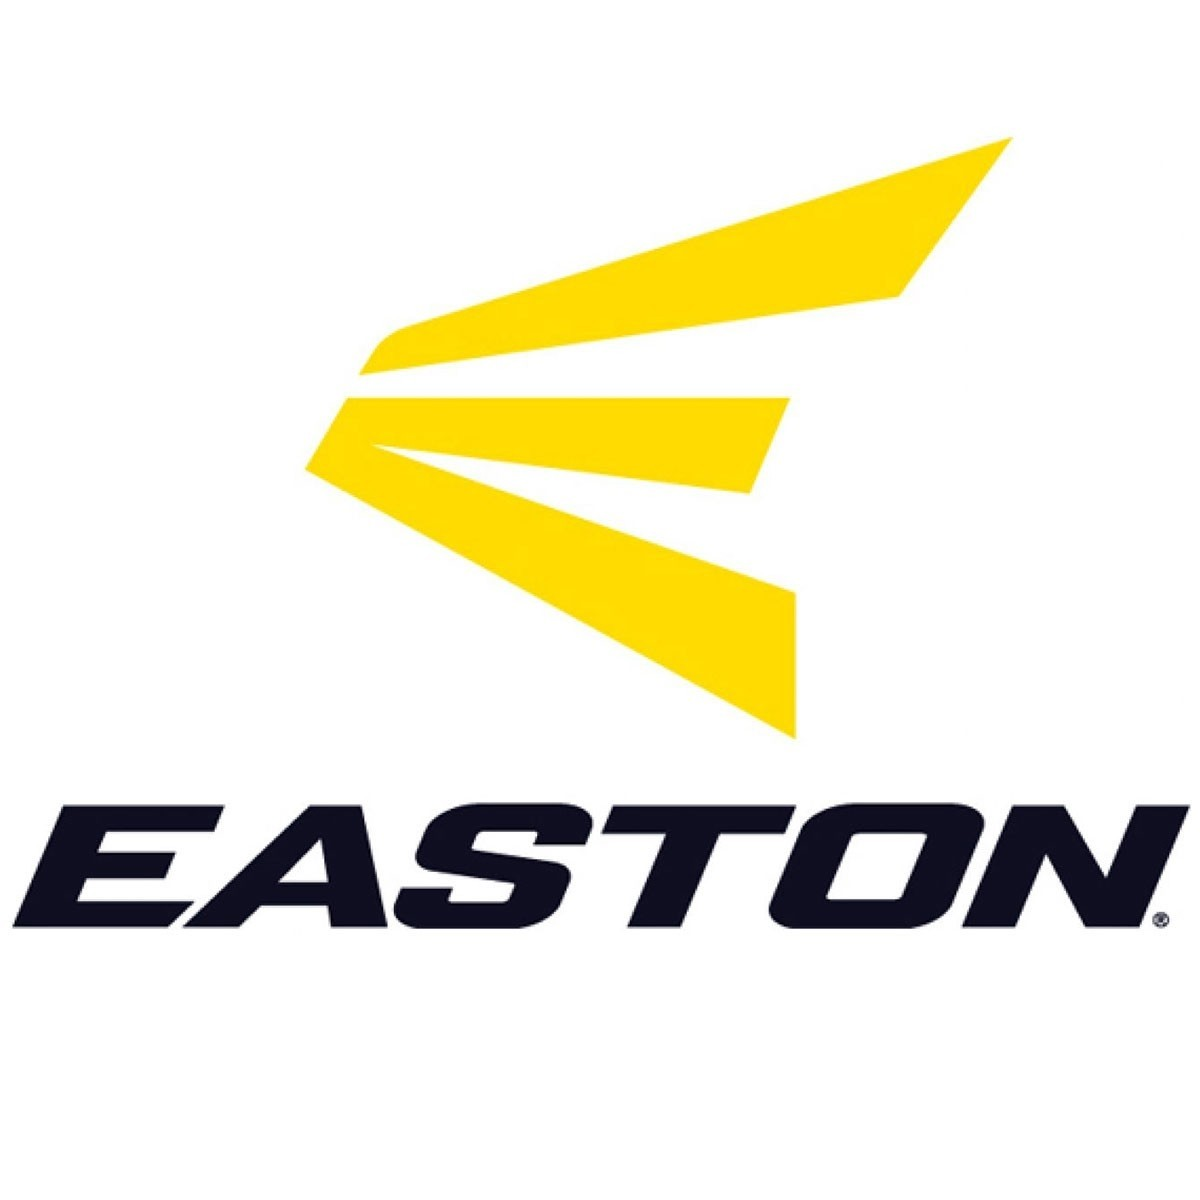 2018 easton ghost x 3 bbcor baseball bat bb18gx for The easton